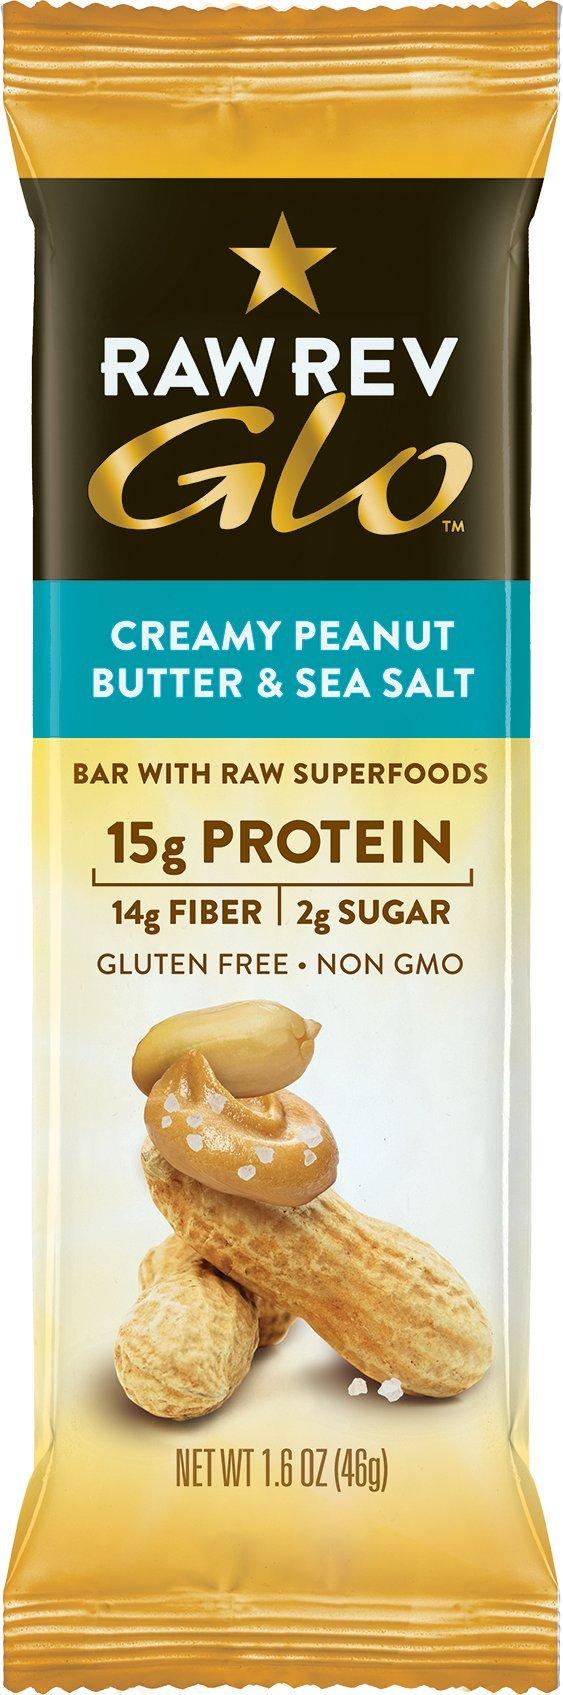 Raw Rev Glo Vegan, Gluten-Free Protein Bars - Creamy Peanut Butter & Sea Salt 1.6 ounce (Pack of 24)